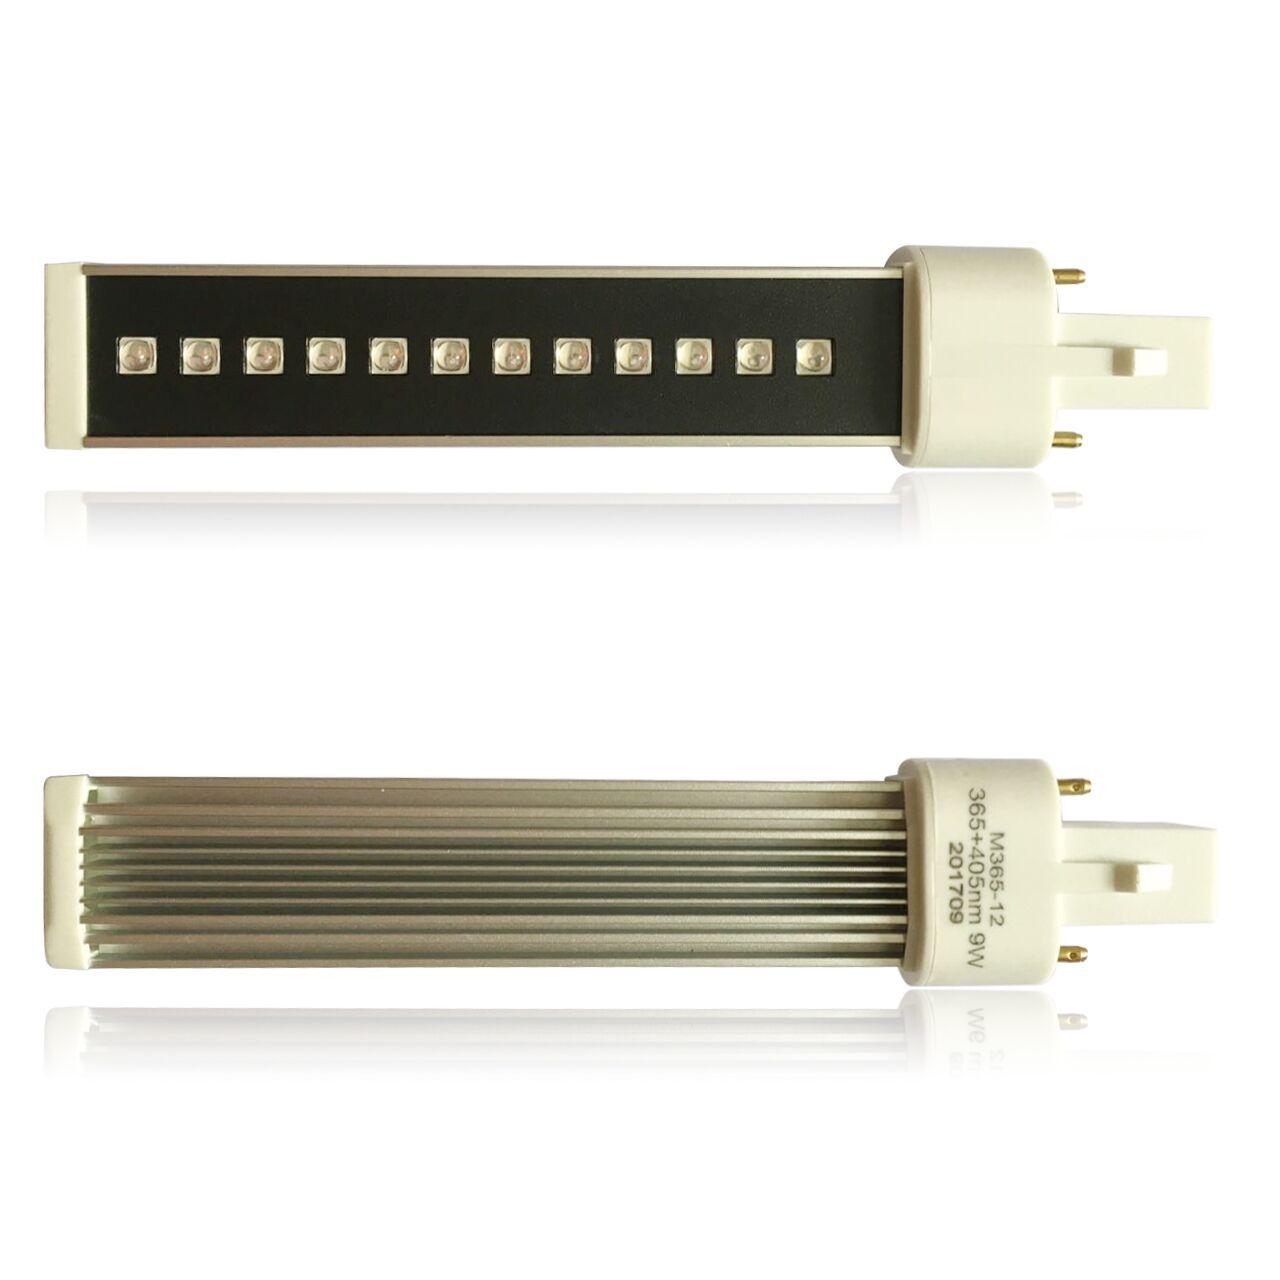 UvLed cső, trafós - 16.5cmH-9W-L